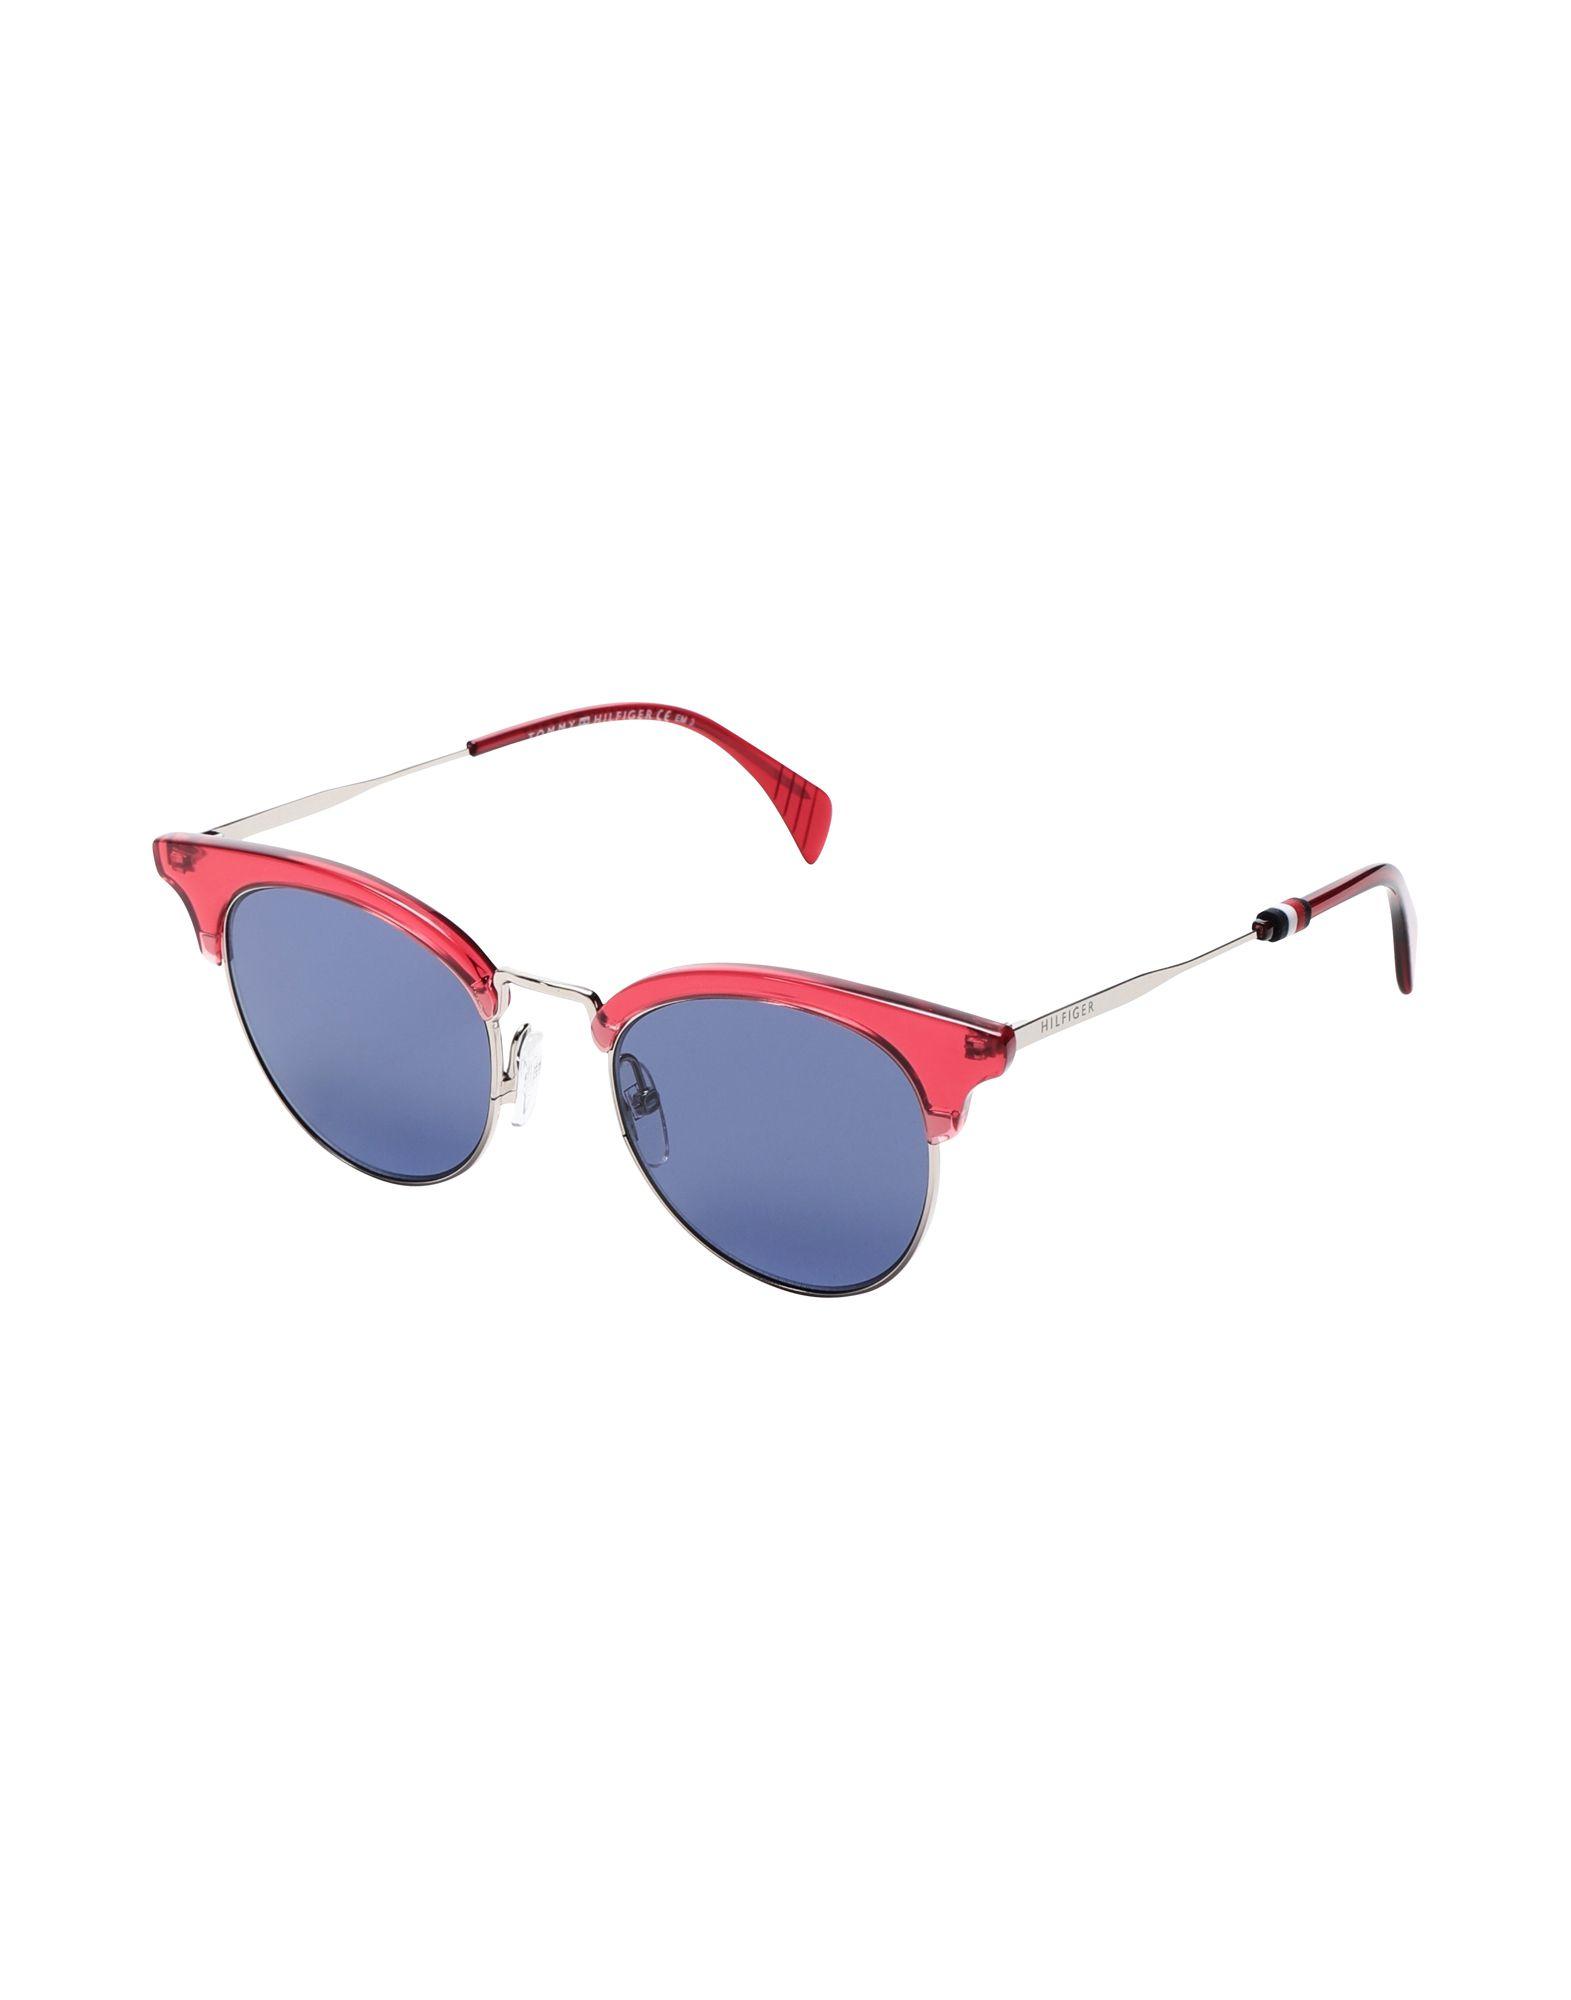 Фото - TOMMY HILFIGER Солнечные очки 3d очки